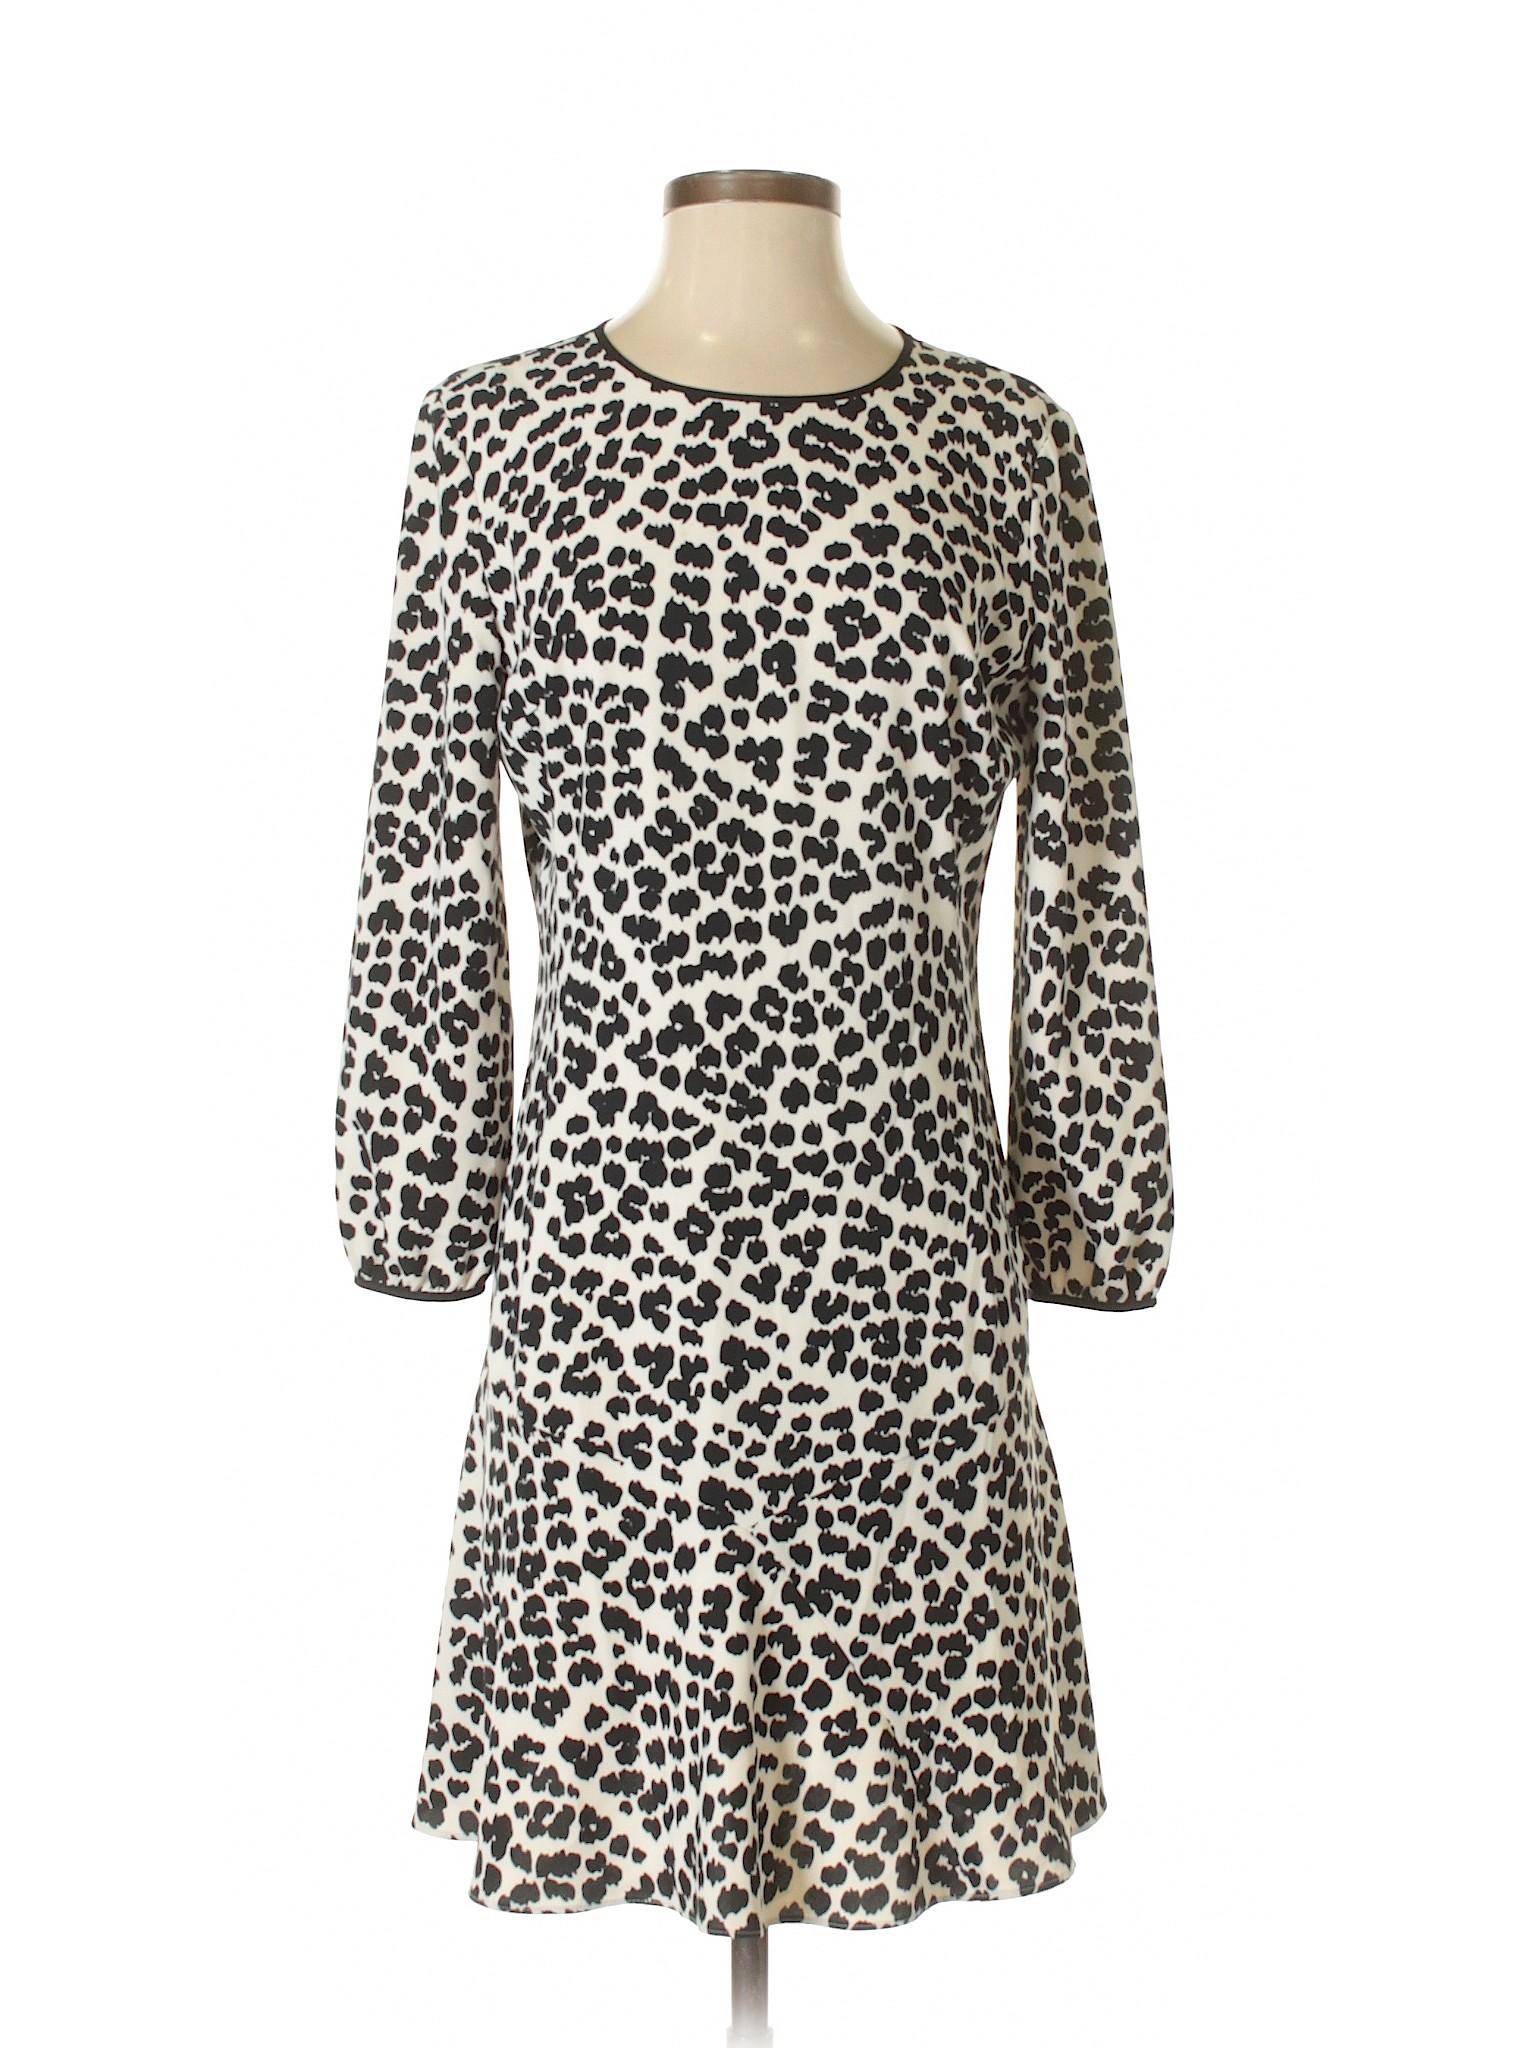 Casual Taylor Selling Dress LOFT Ann qtv7wnnz8